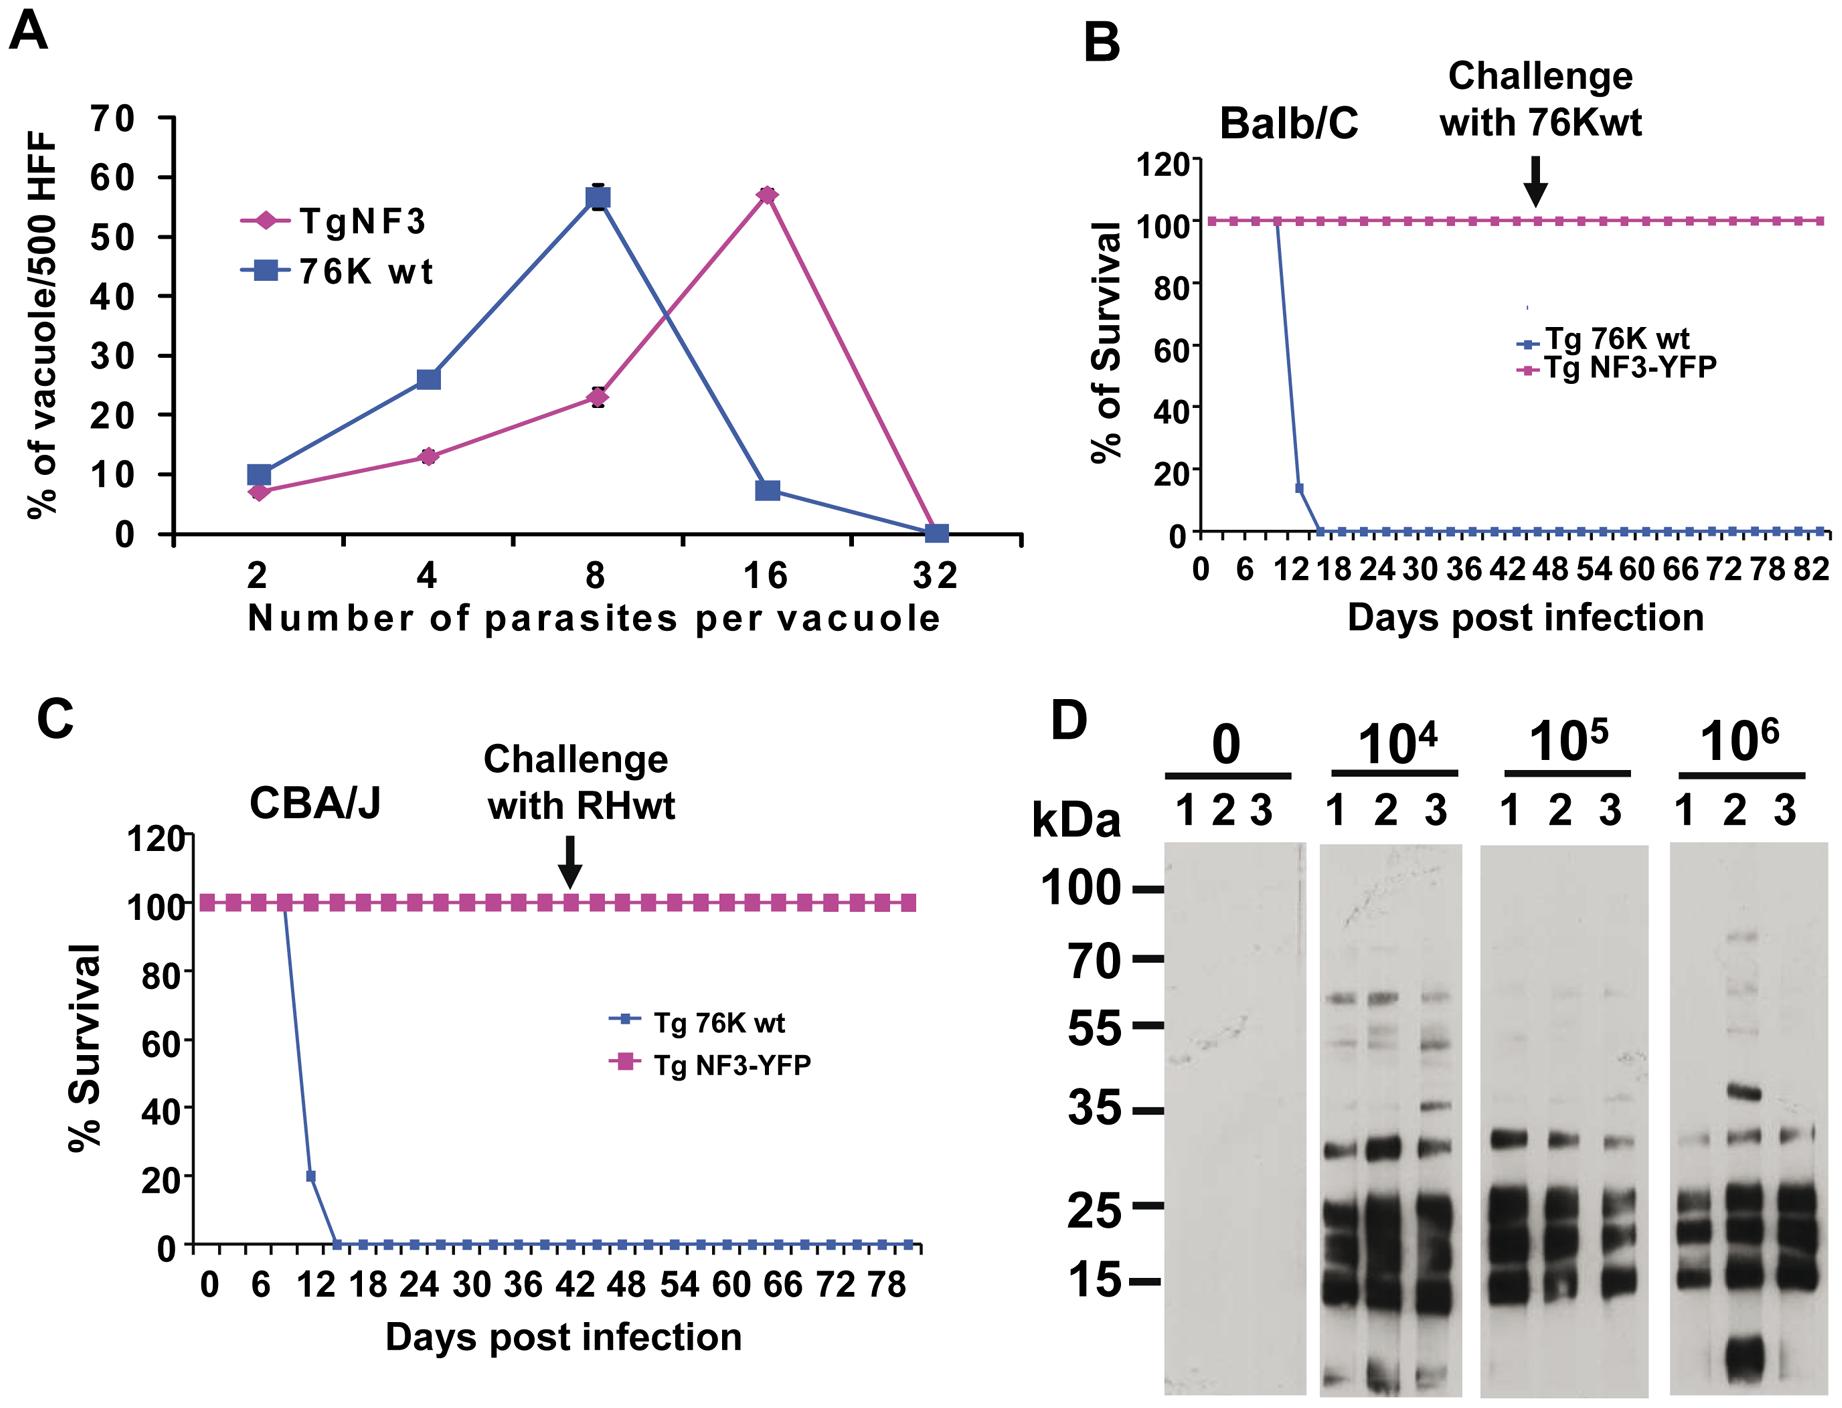 Ectopic expression of TgNF3 enhances parasite replication <i>in vitro</i> but drastically attenuates parasite virulence <i>in vivo</i>.